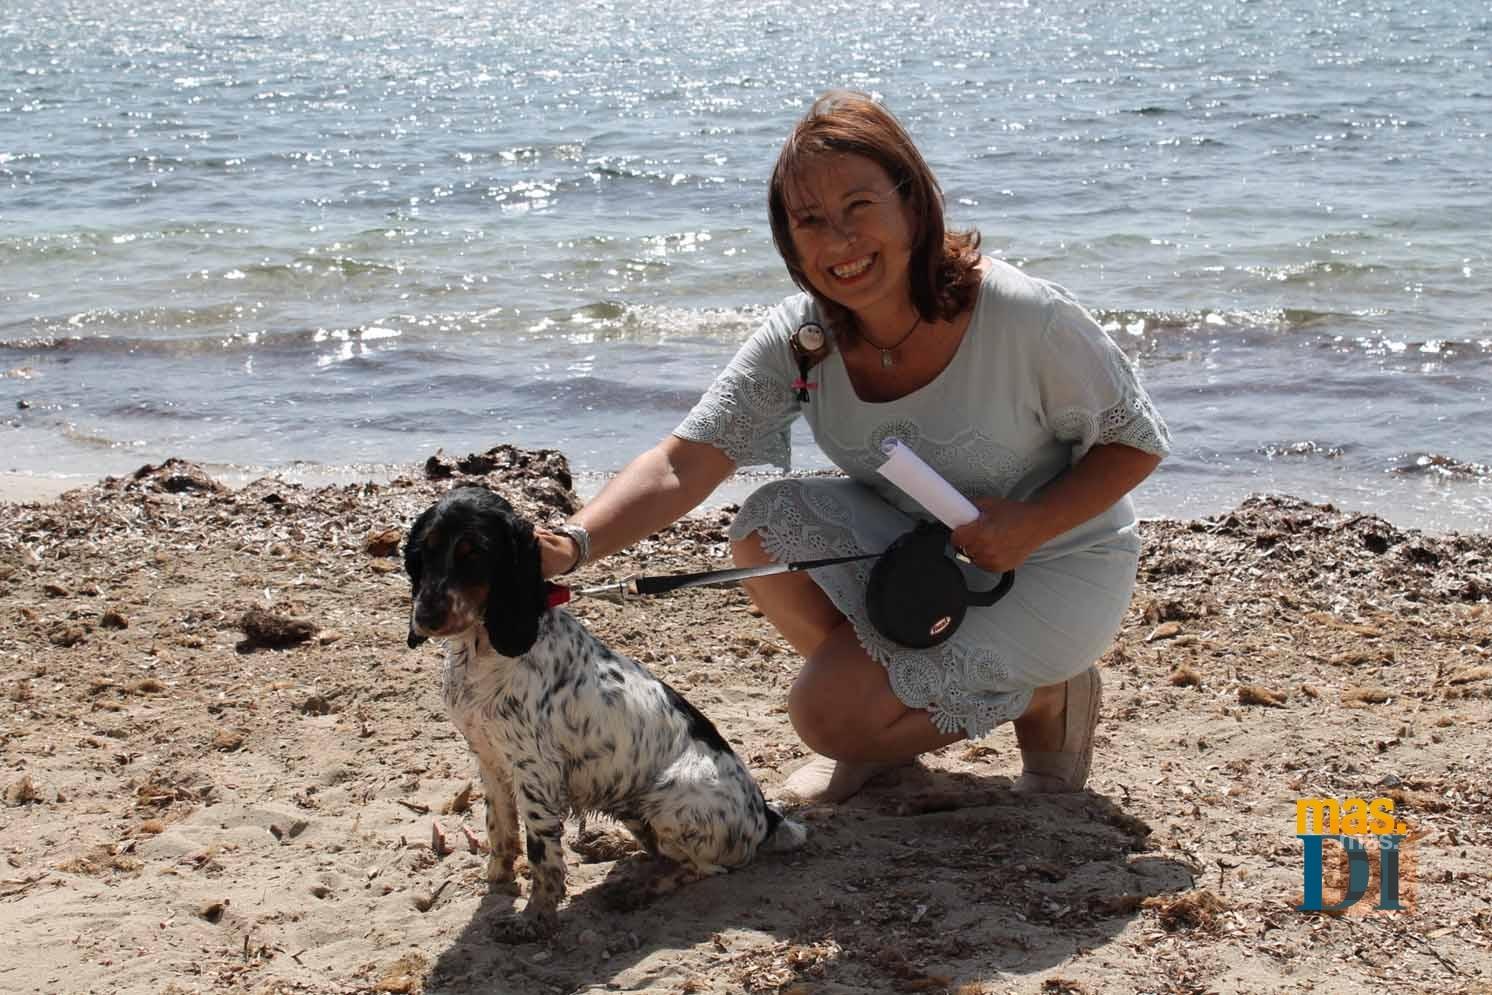 Ajuntament d'Eivissa, un municipio amable para las mascotas